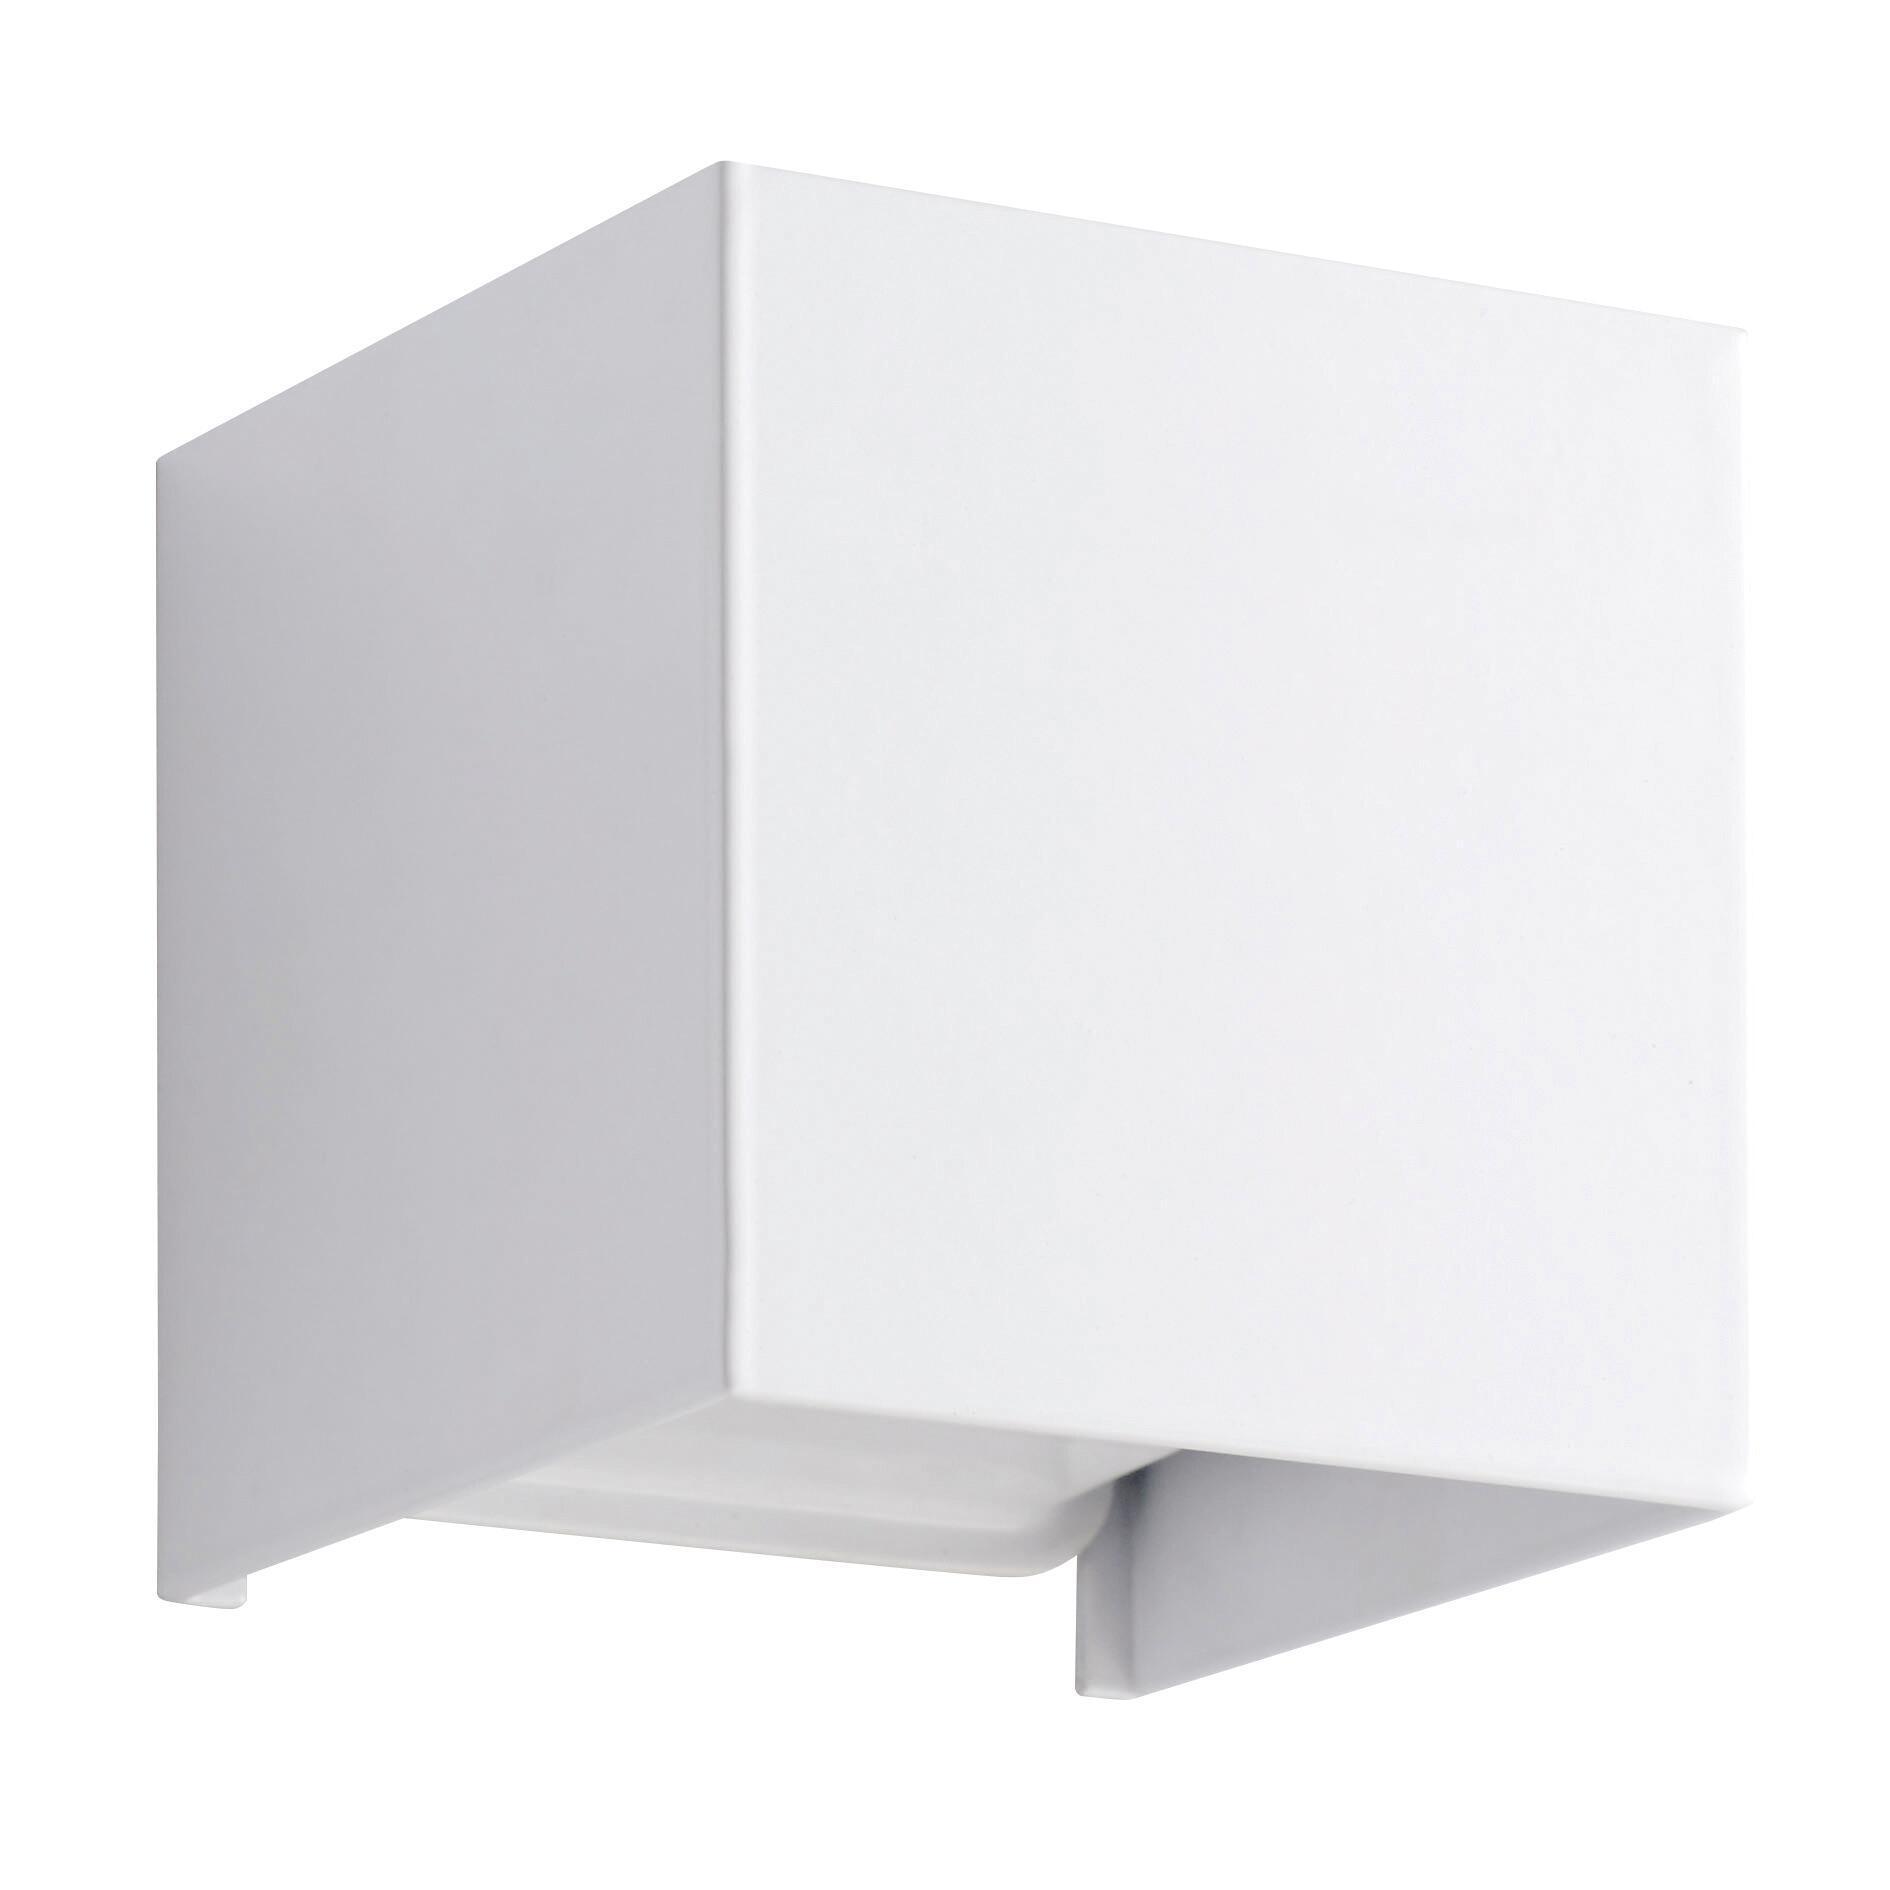 Applique design Kubbo LED integrato bianco, in alluminio, D. 10.0 cm 10.0x10.0 cm, INSPIRE - 4